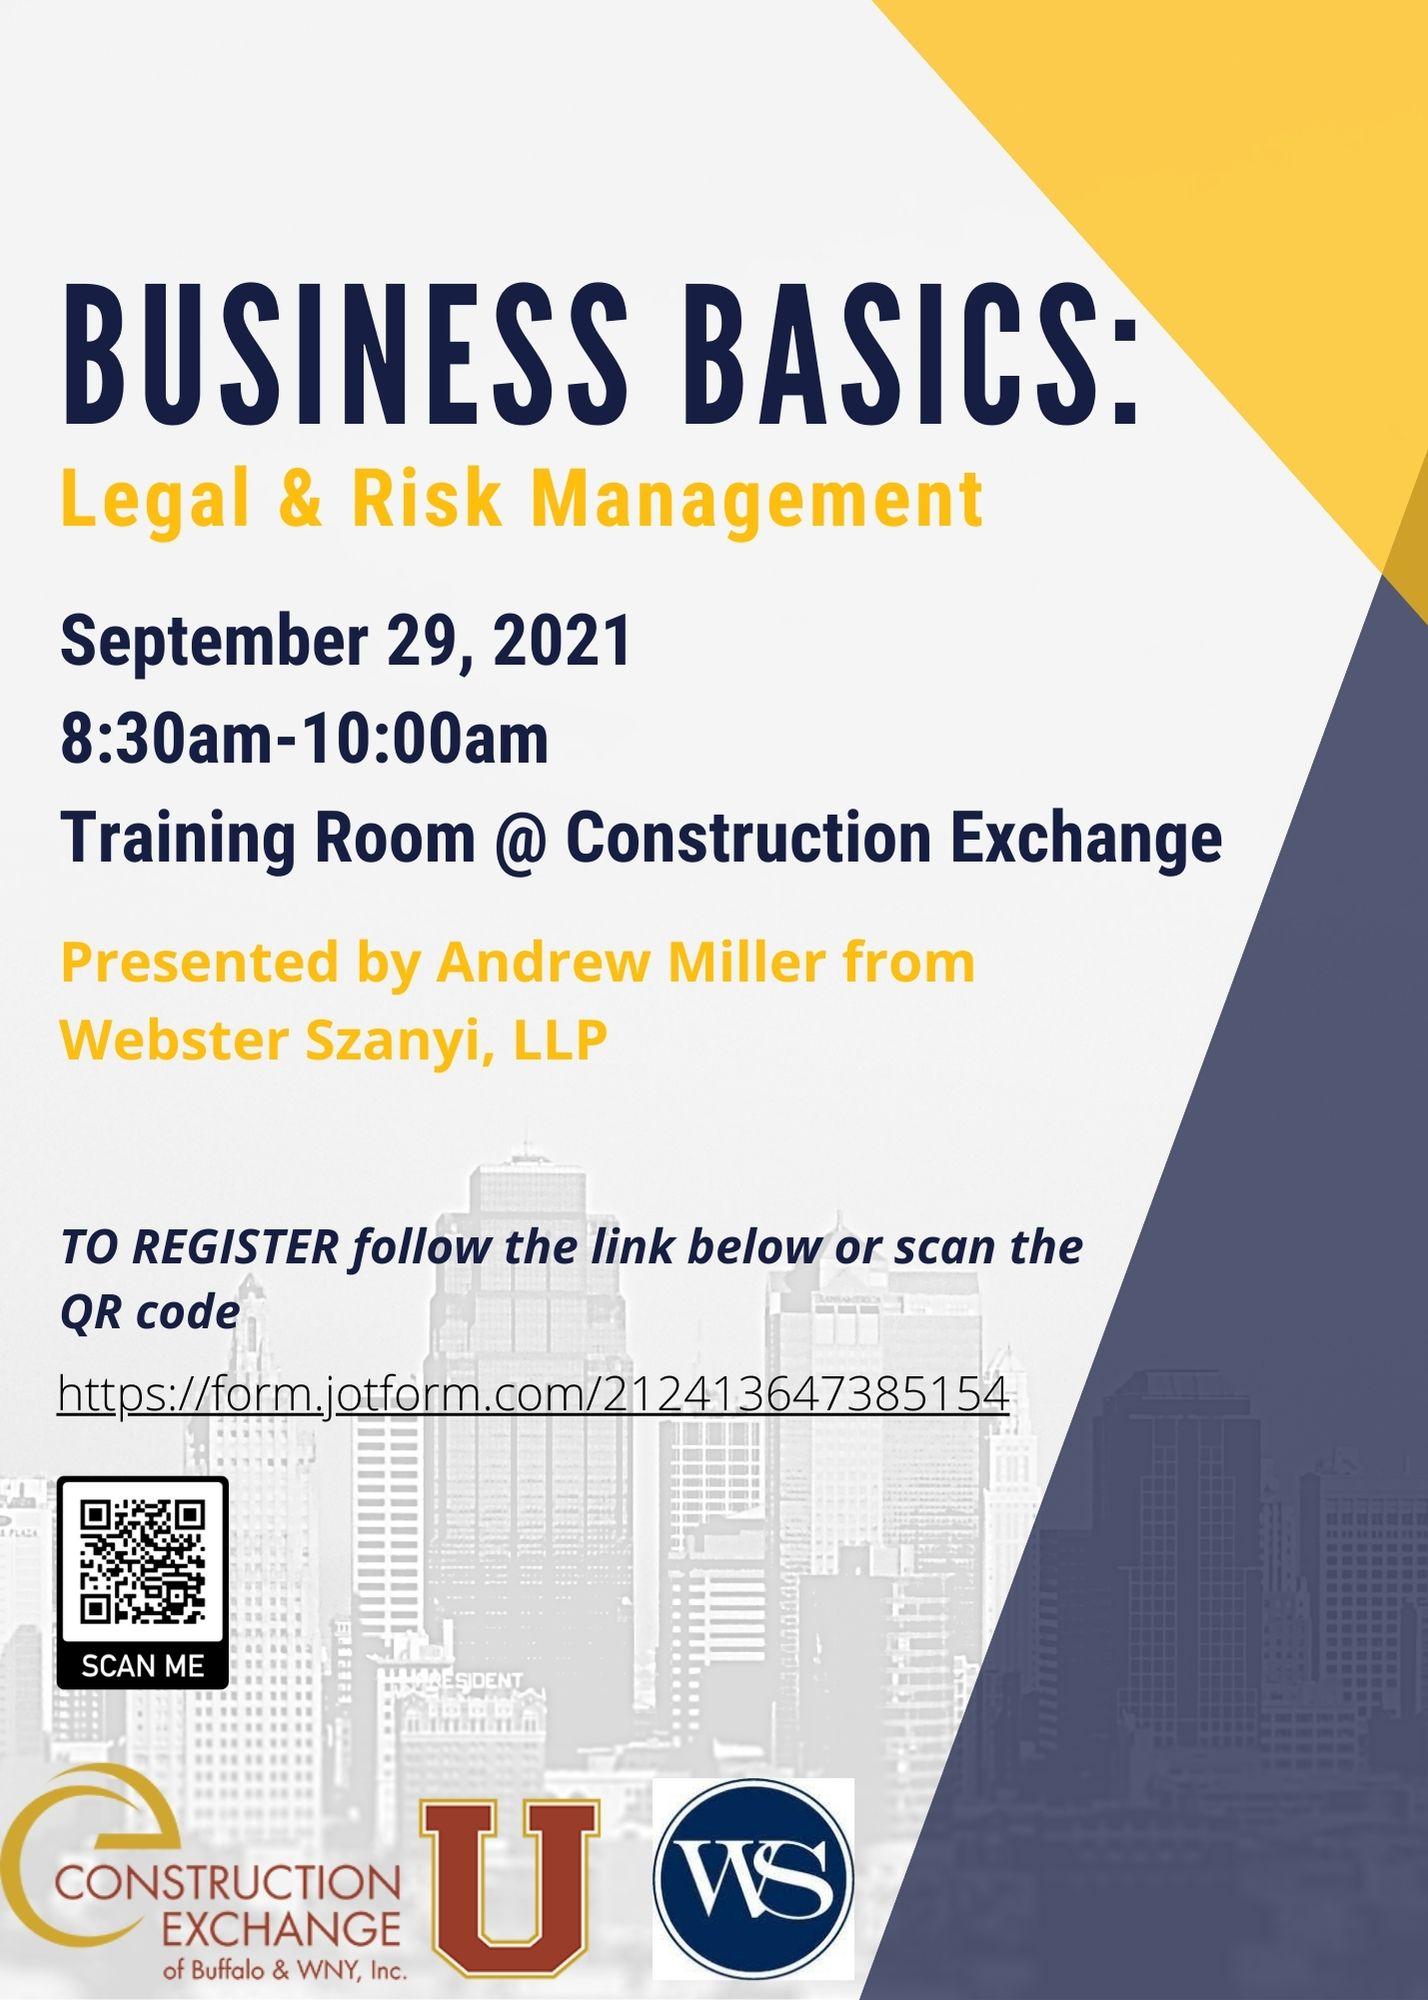 Business Basics: Legal & Risk Management